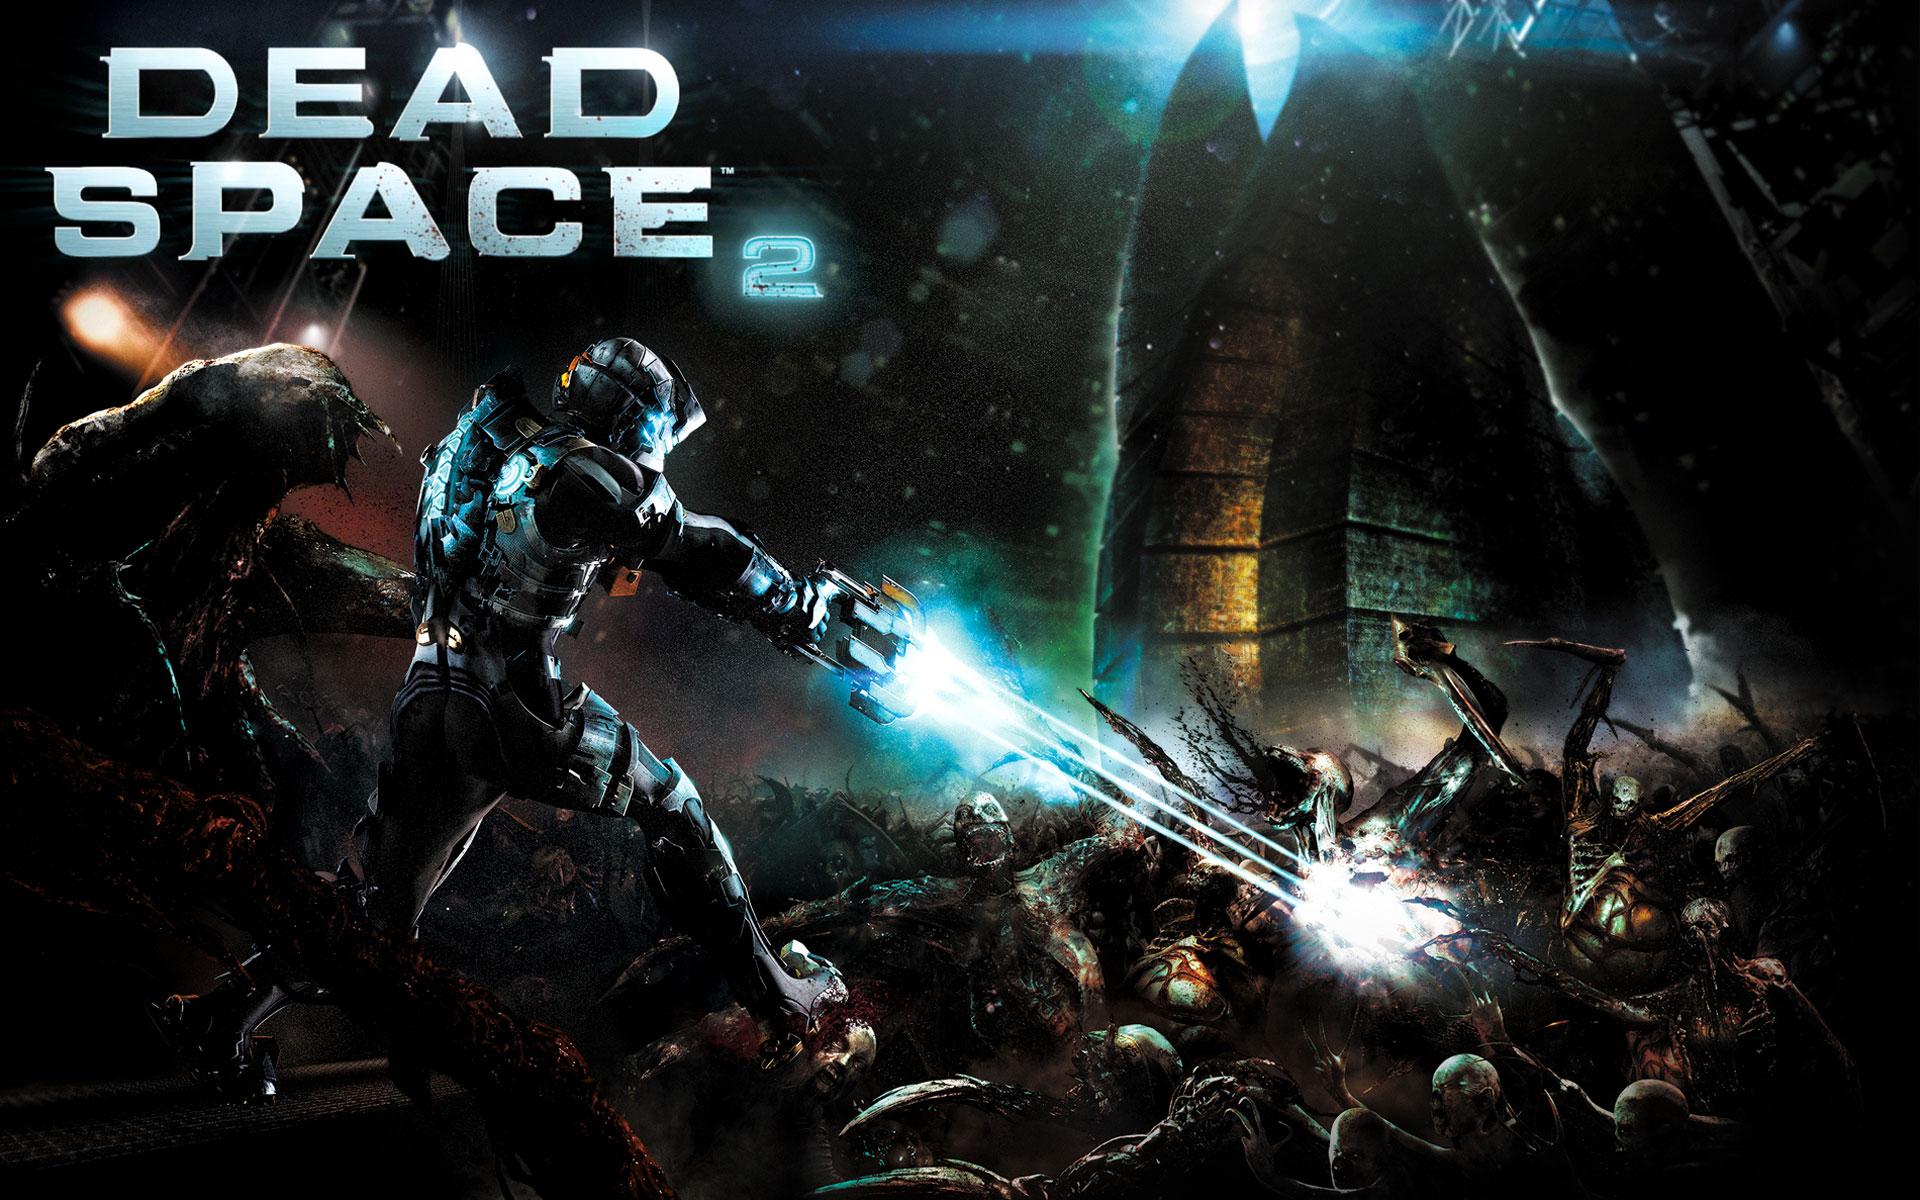 Арт к игре Dead Space 2